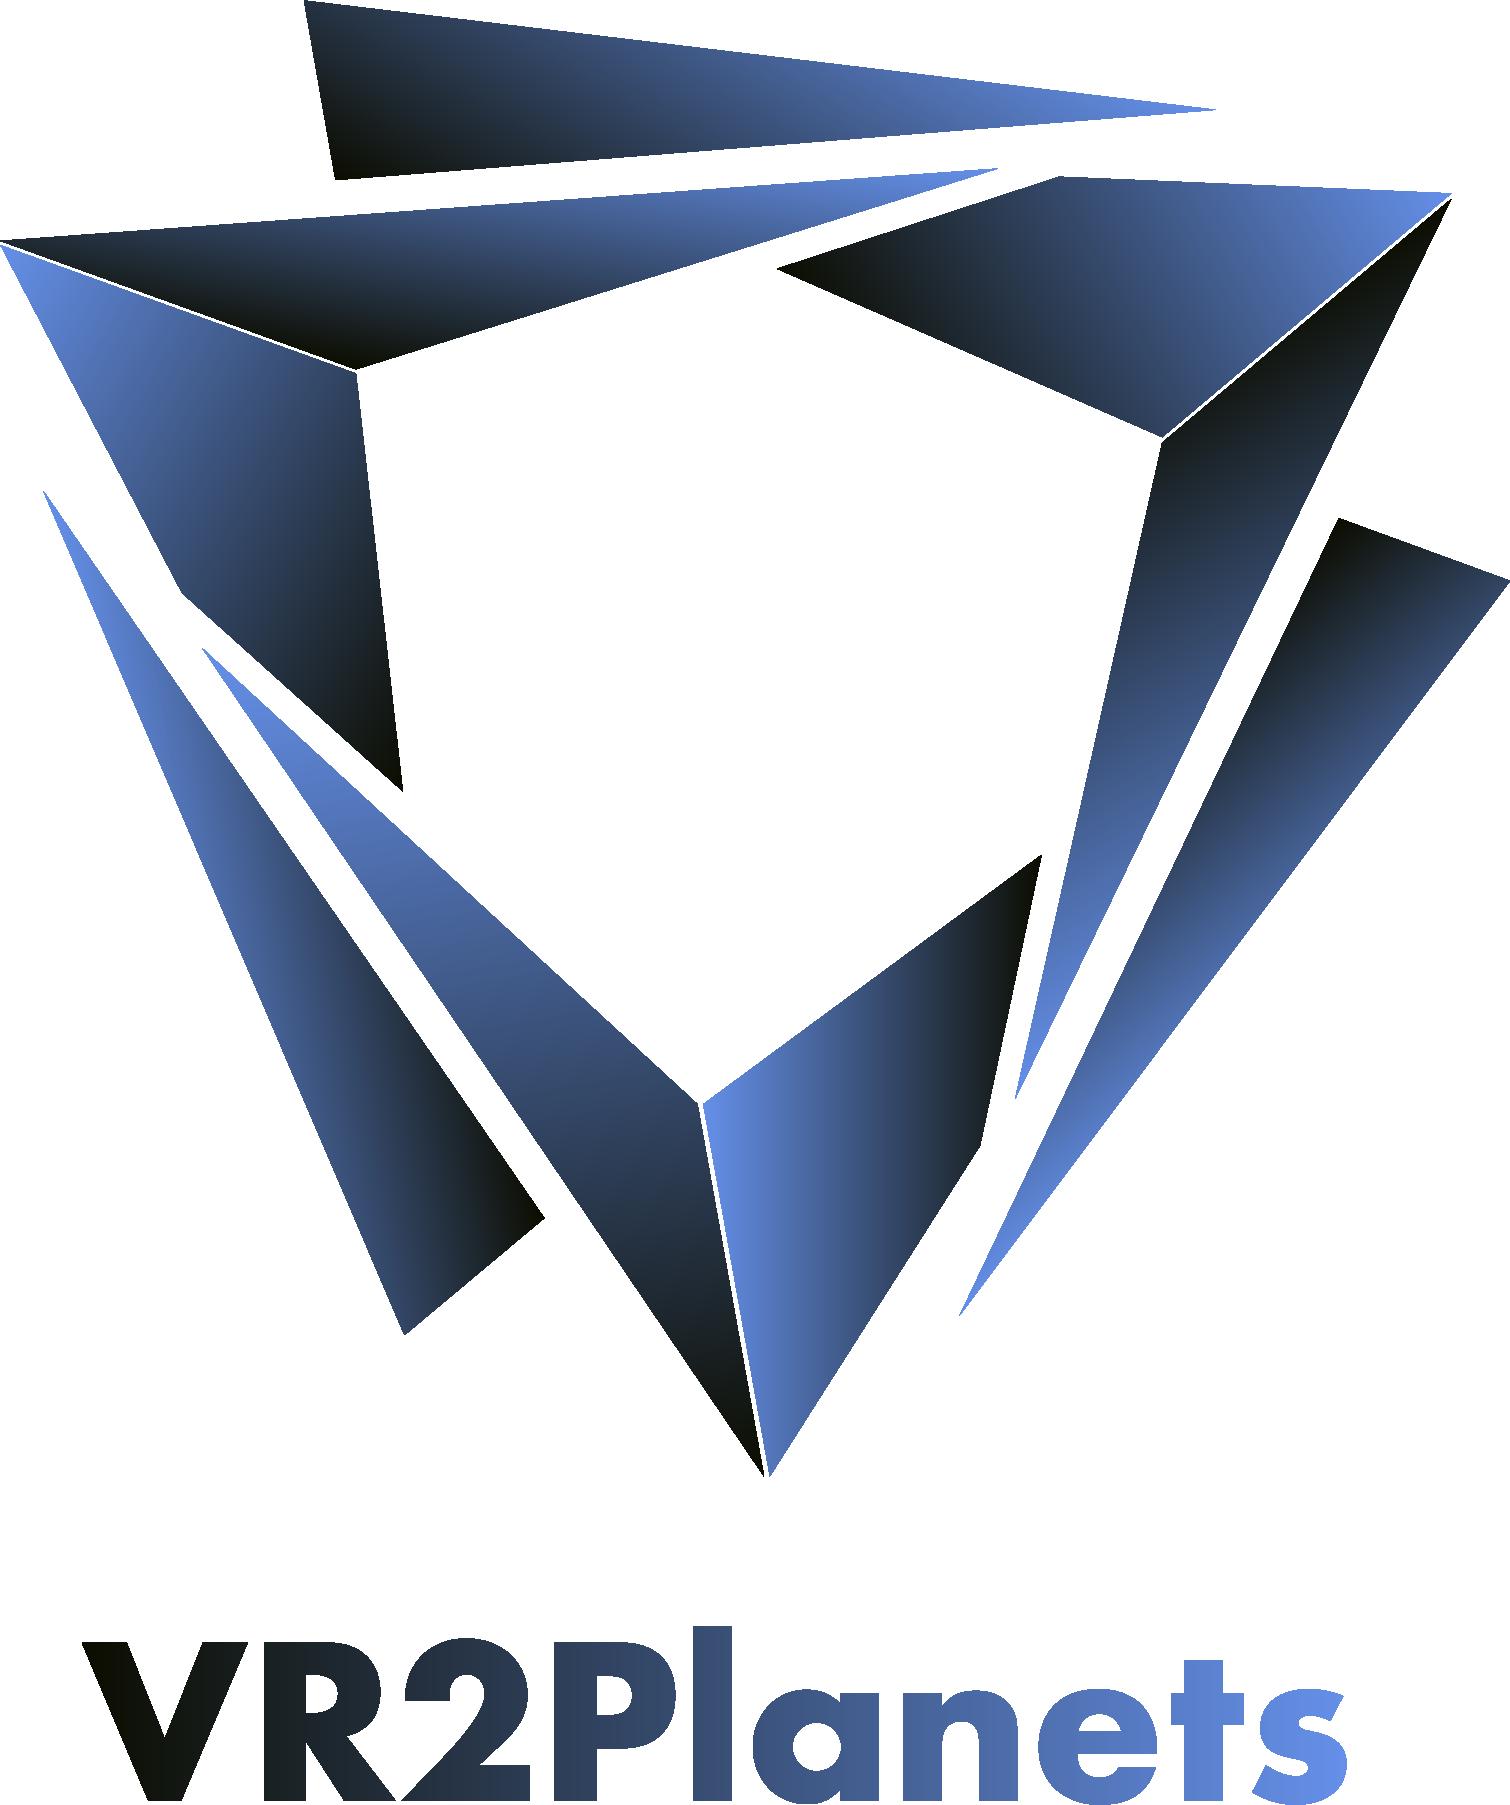 VR2PLanets logo